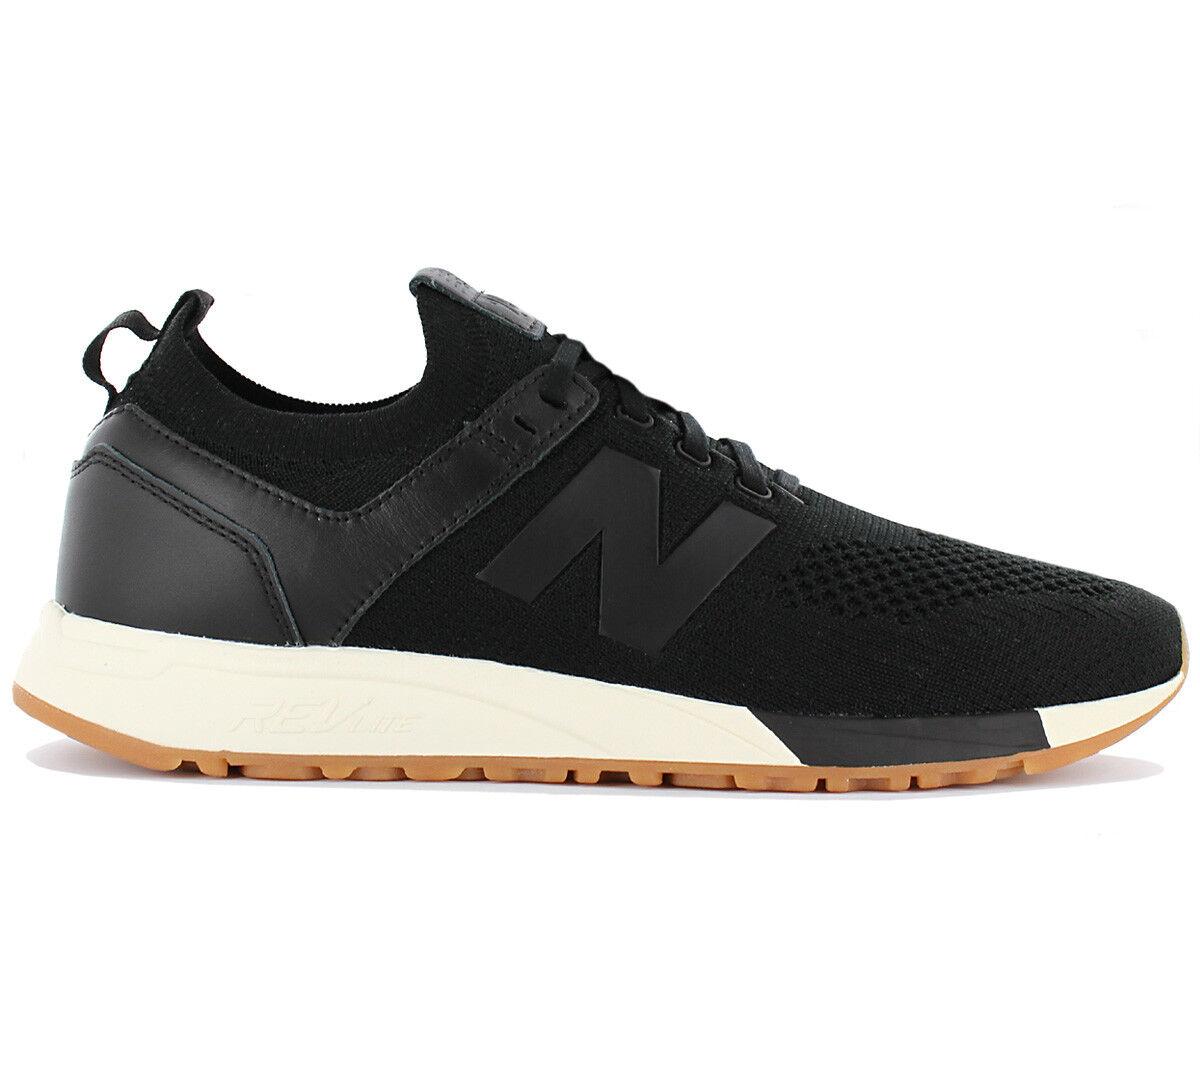 New Balance Lifestyle 247 REVlite Herren Sneaker Schuhe MRL247DB Turnschuhe NEU